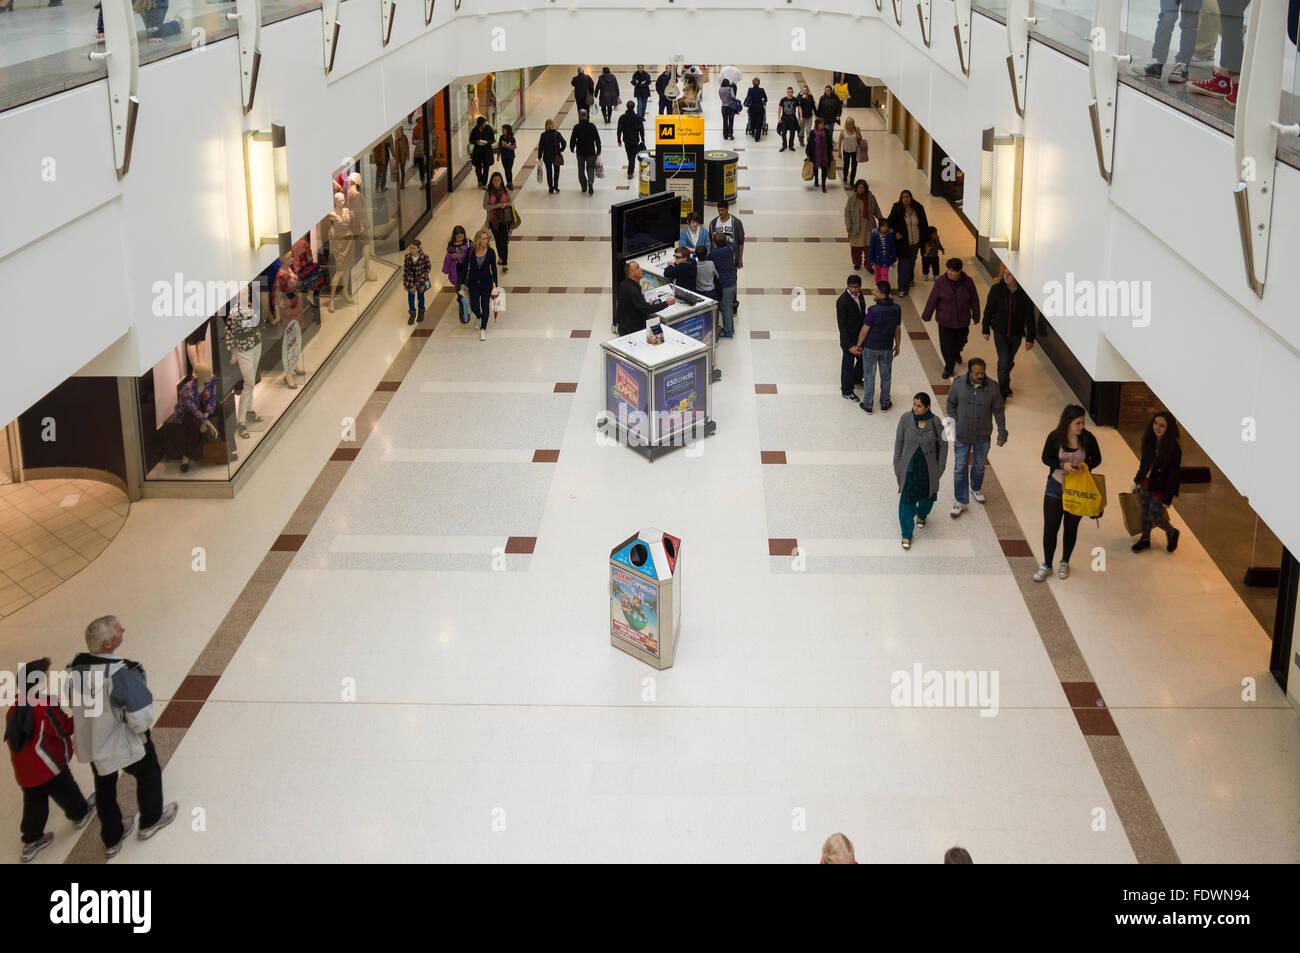 Braehead Shopping Centre, Scotland, UK  Model Release: No.  Property Release: No. - Stock Image